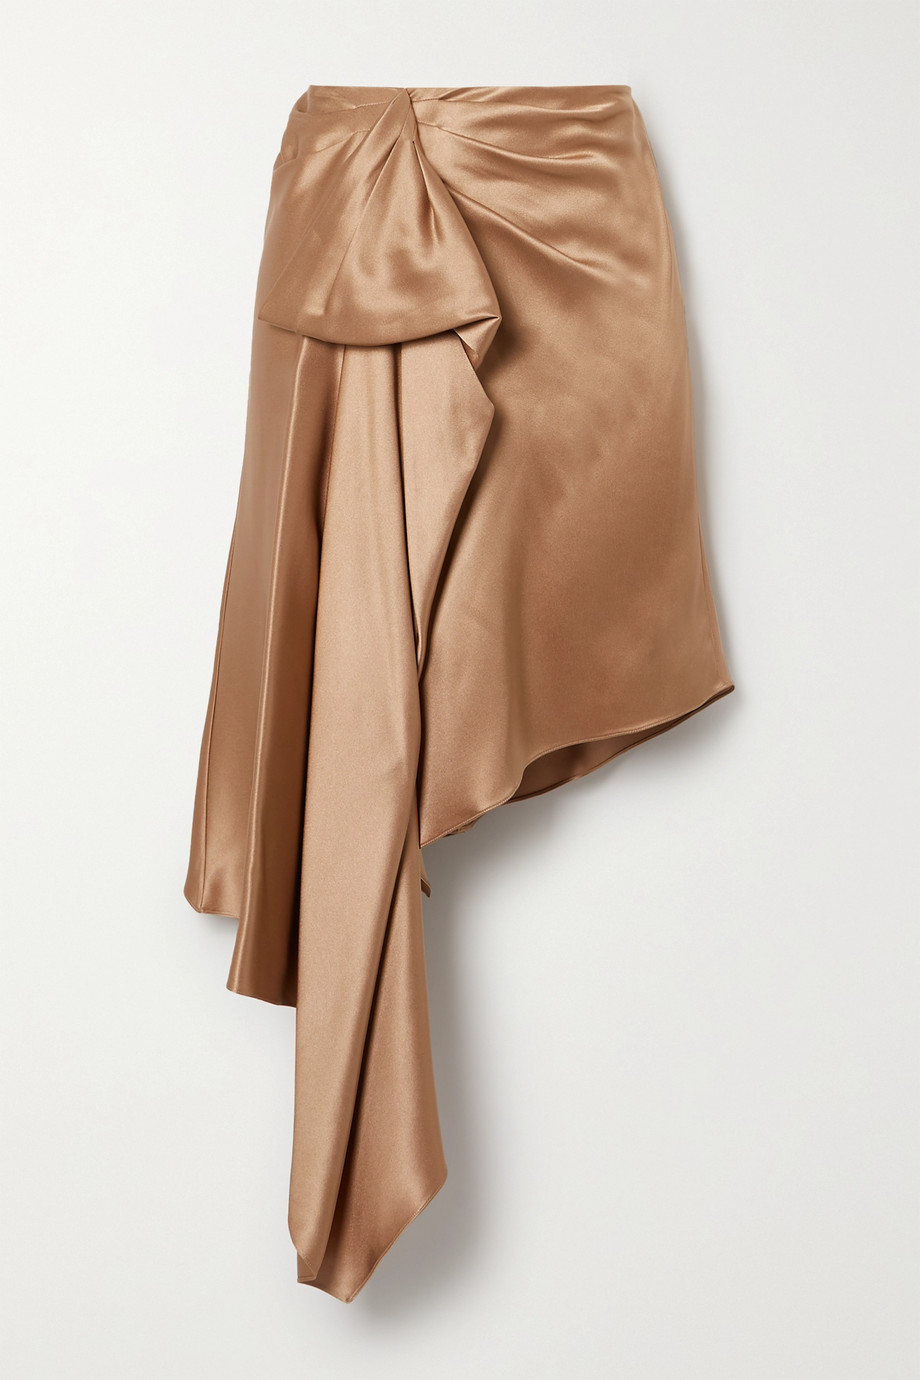 Cushnie Asymmetric draped silk-charmeuse skirt